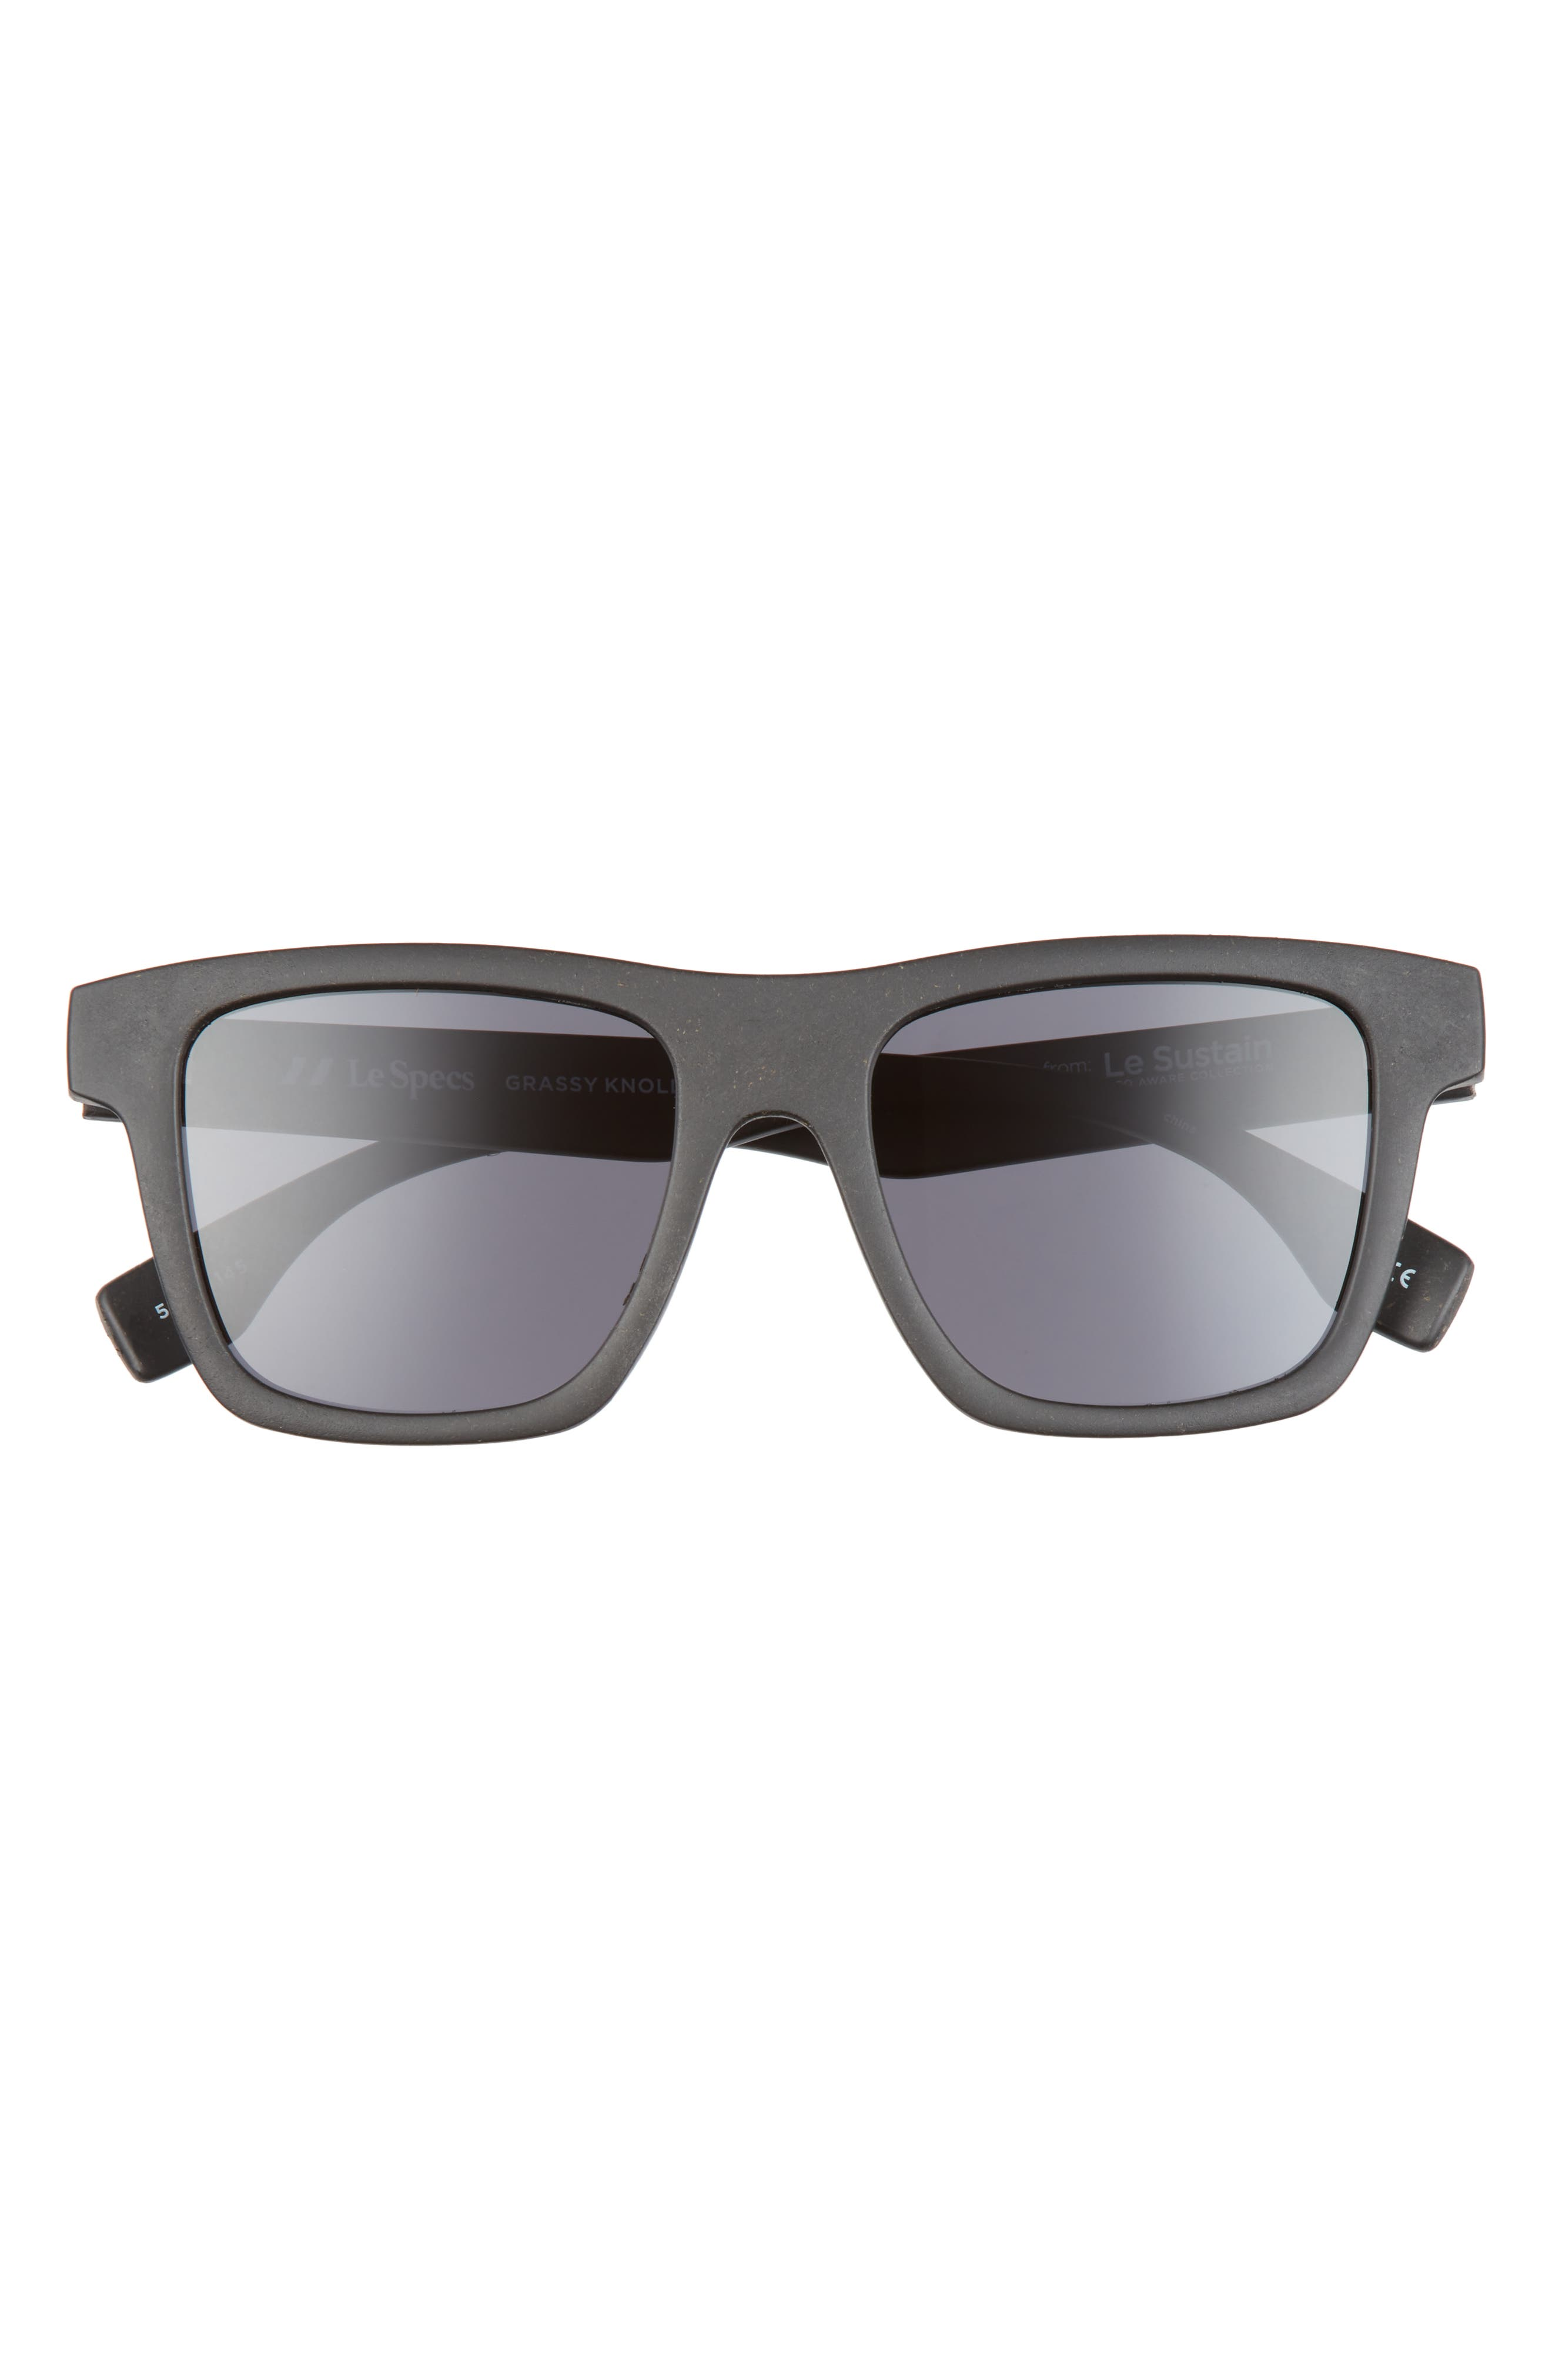 Grassy Knoll 52mm Square Sunglasses